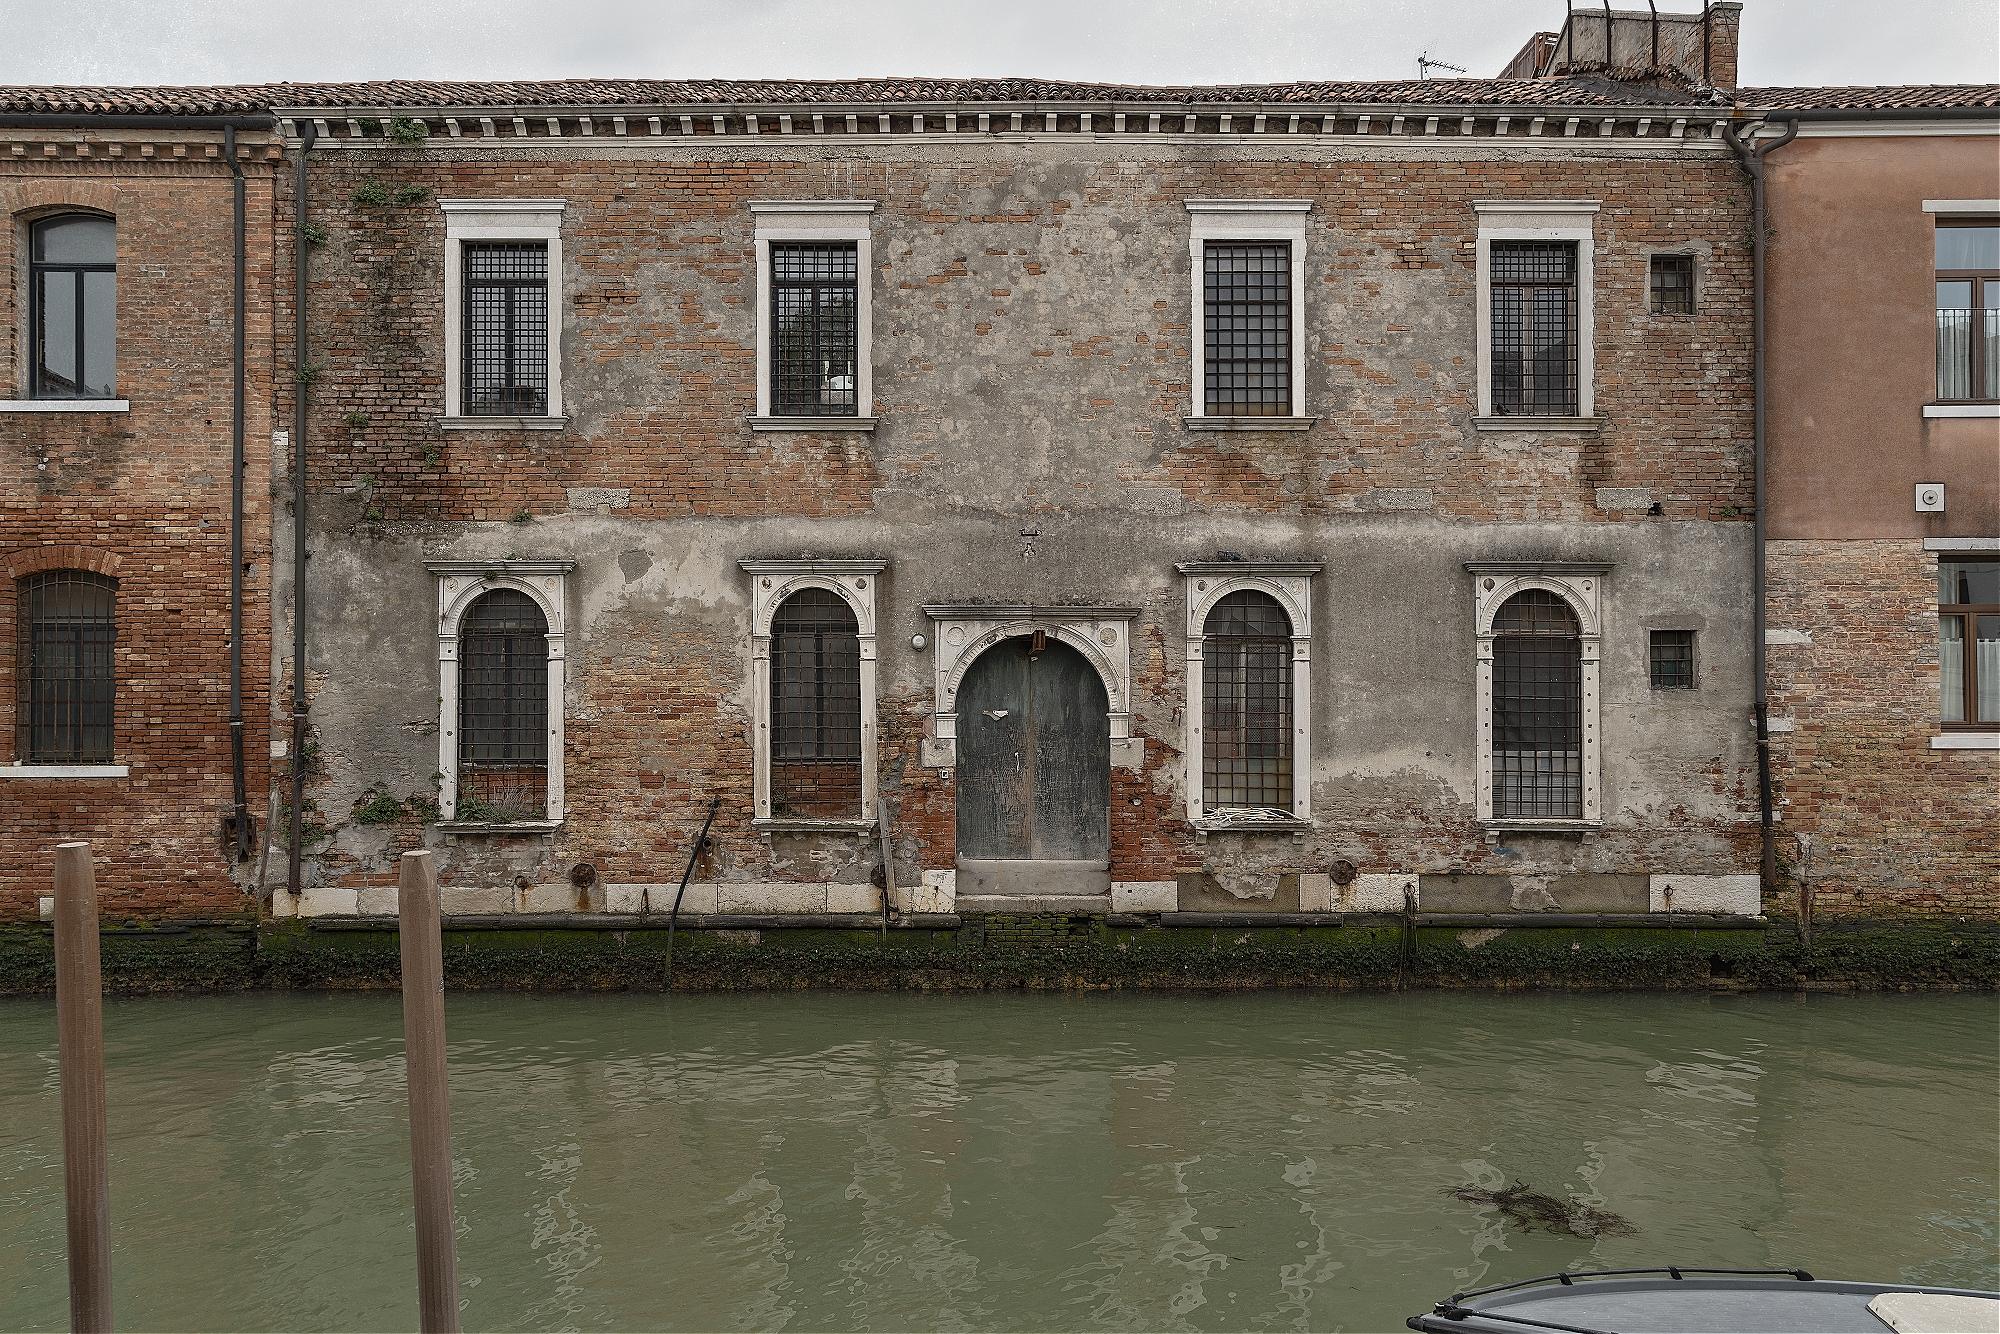 Venice 2019 _A731091-Edit.jpg